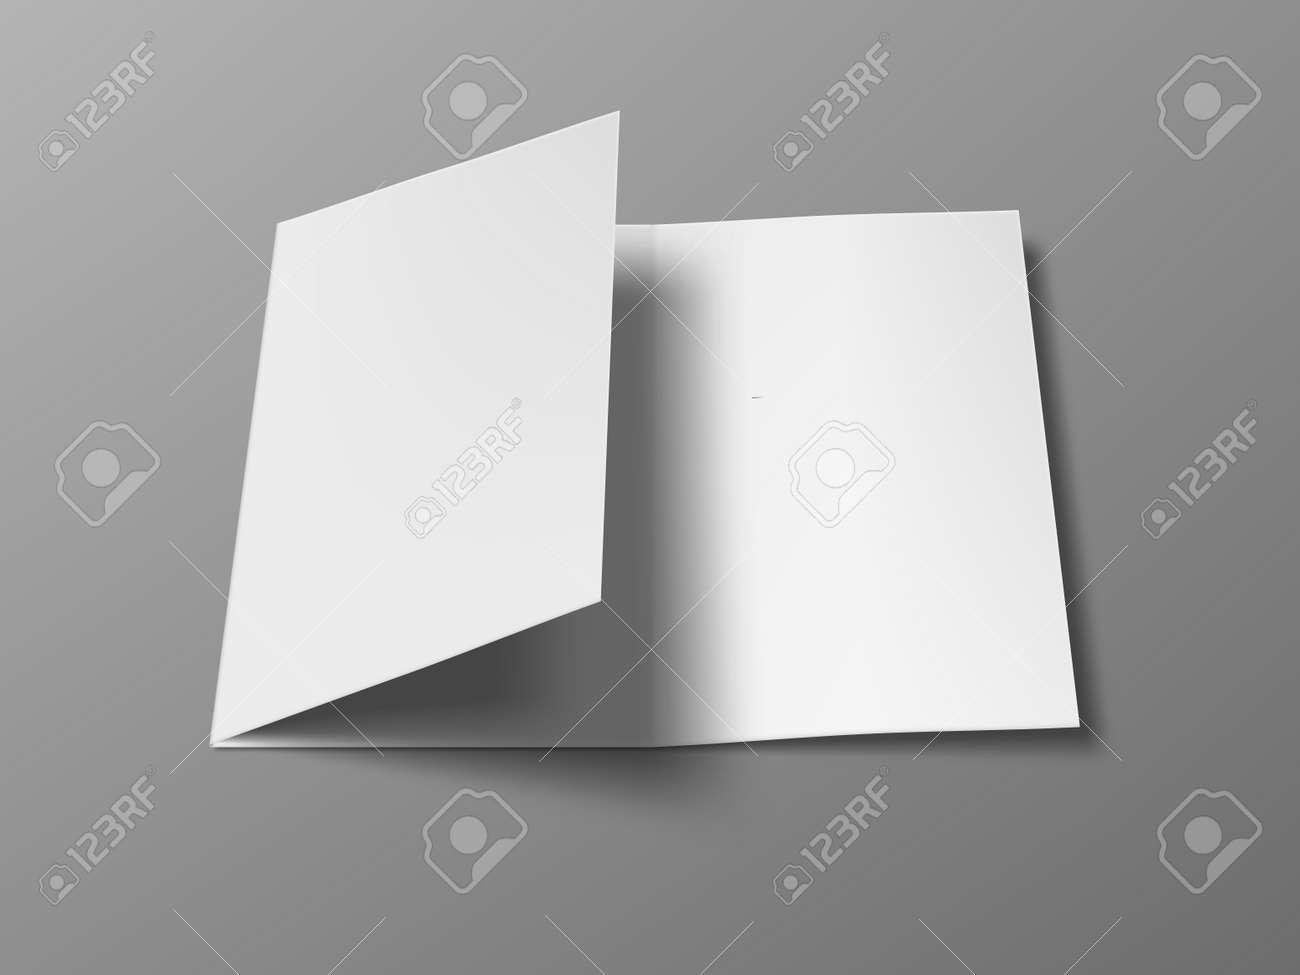 3D A4 Three Fold Blank Brochure Template - 169410475